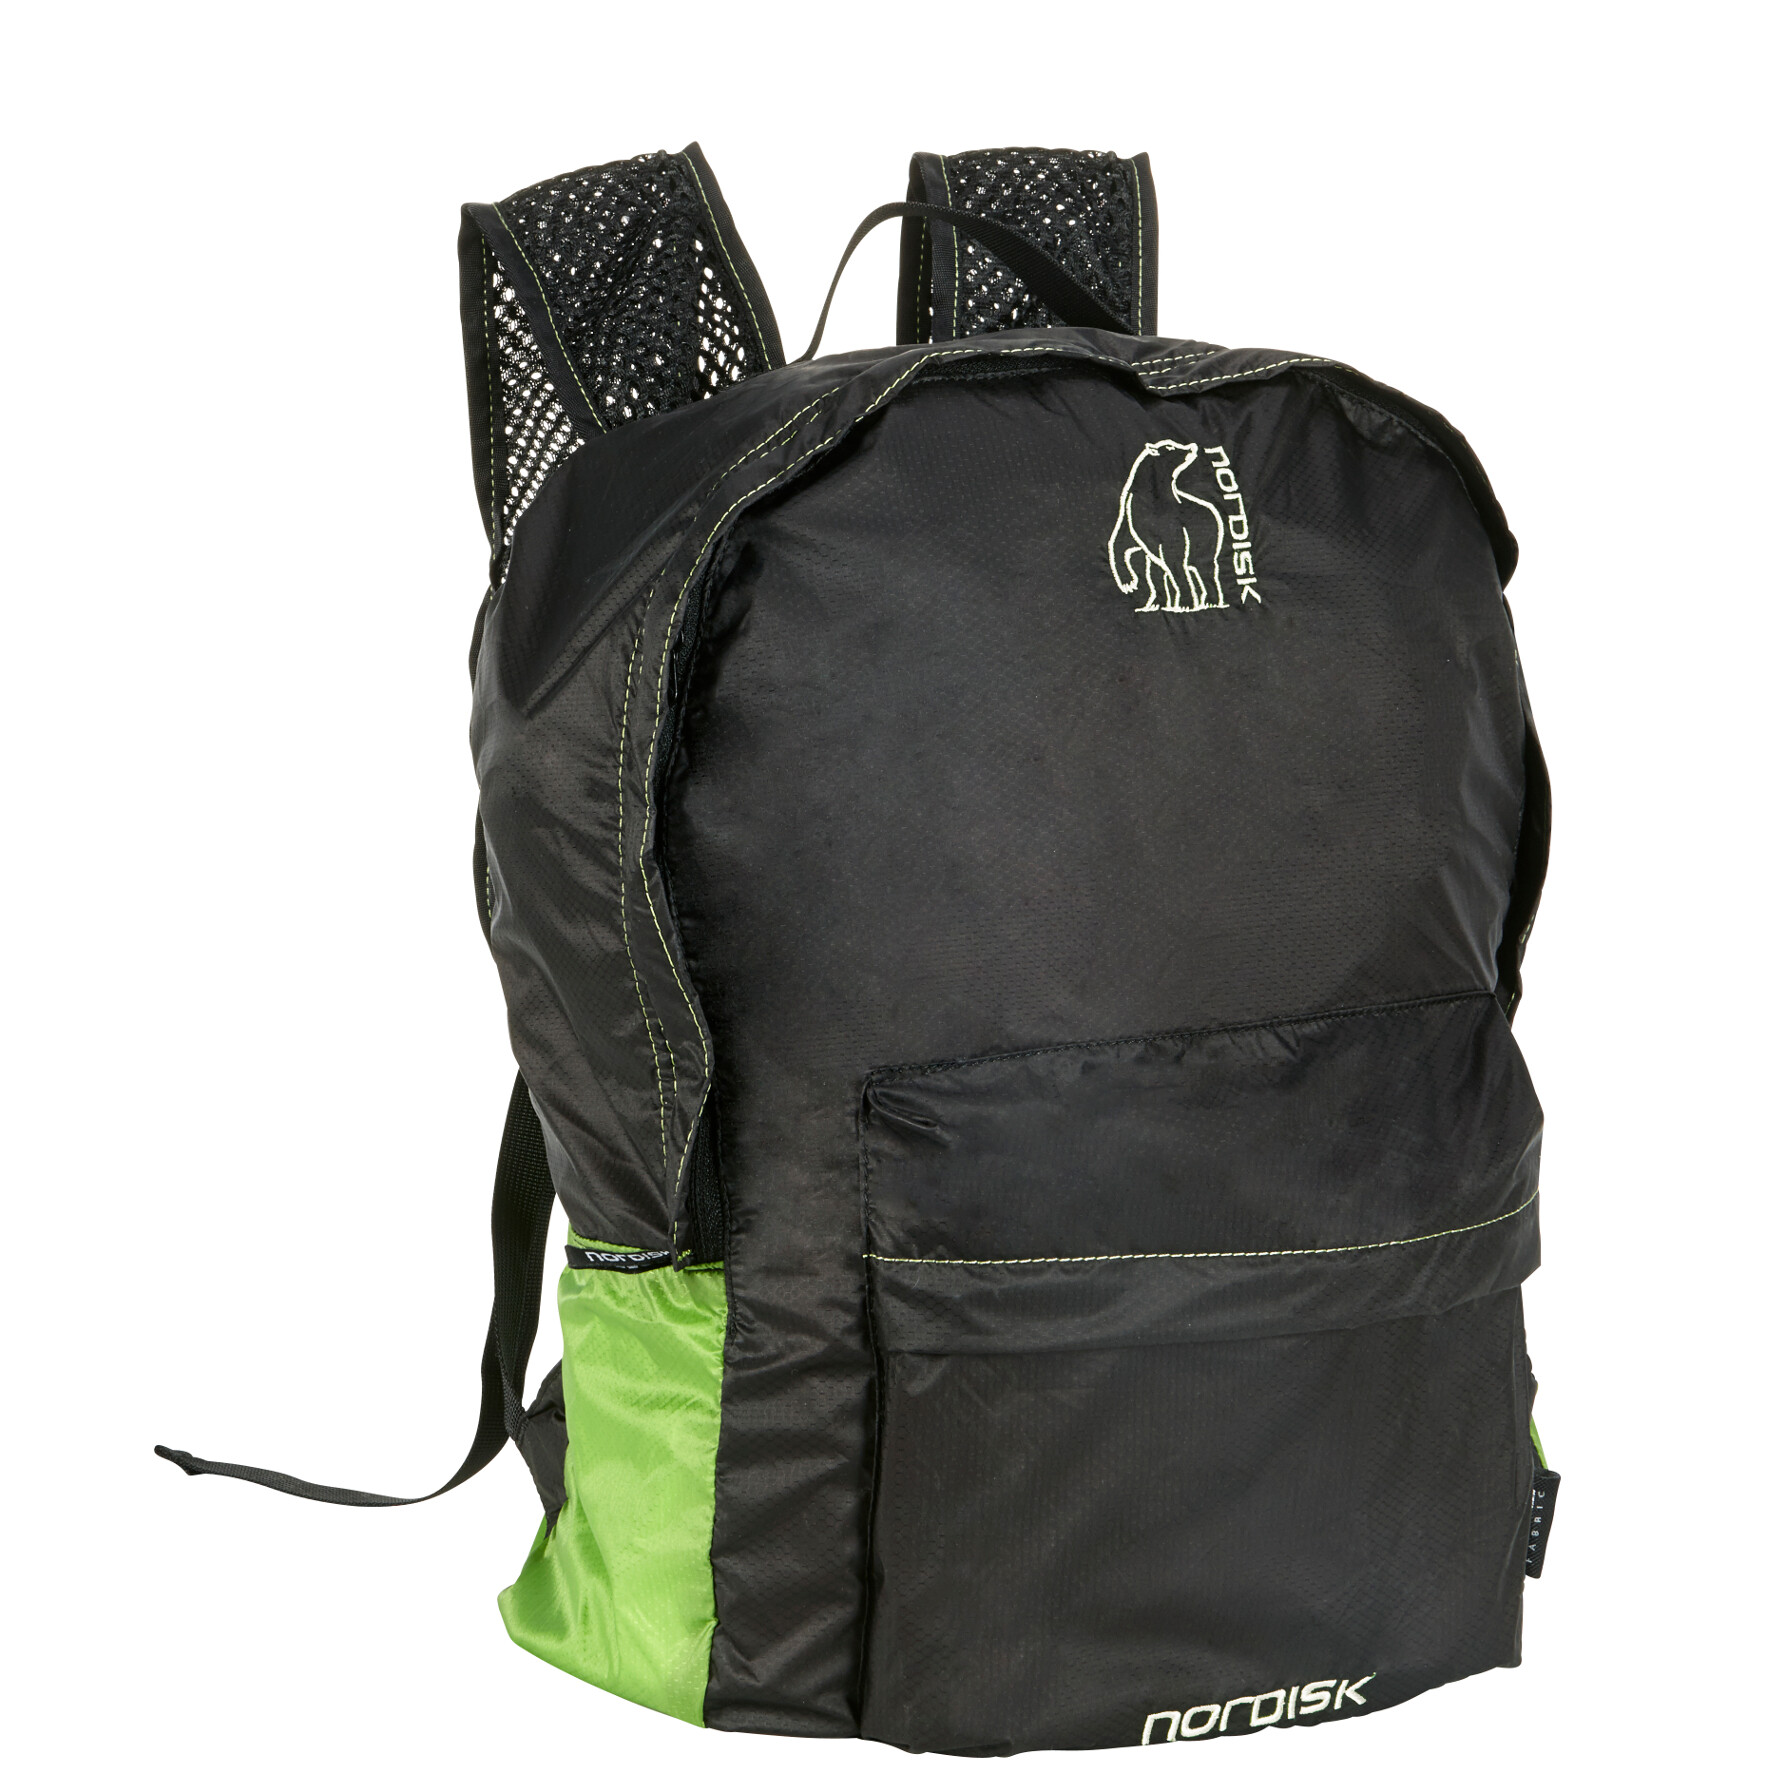 Nordisk Ribe Rygsæk 20l, green/black (2019) | Travel bags